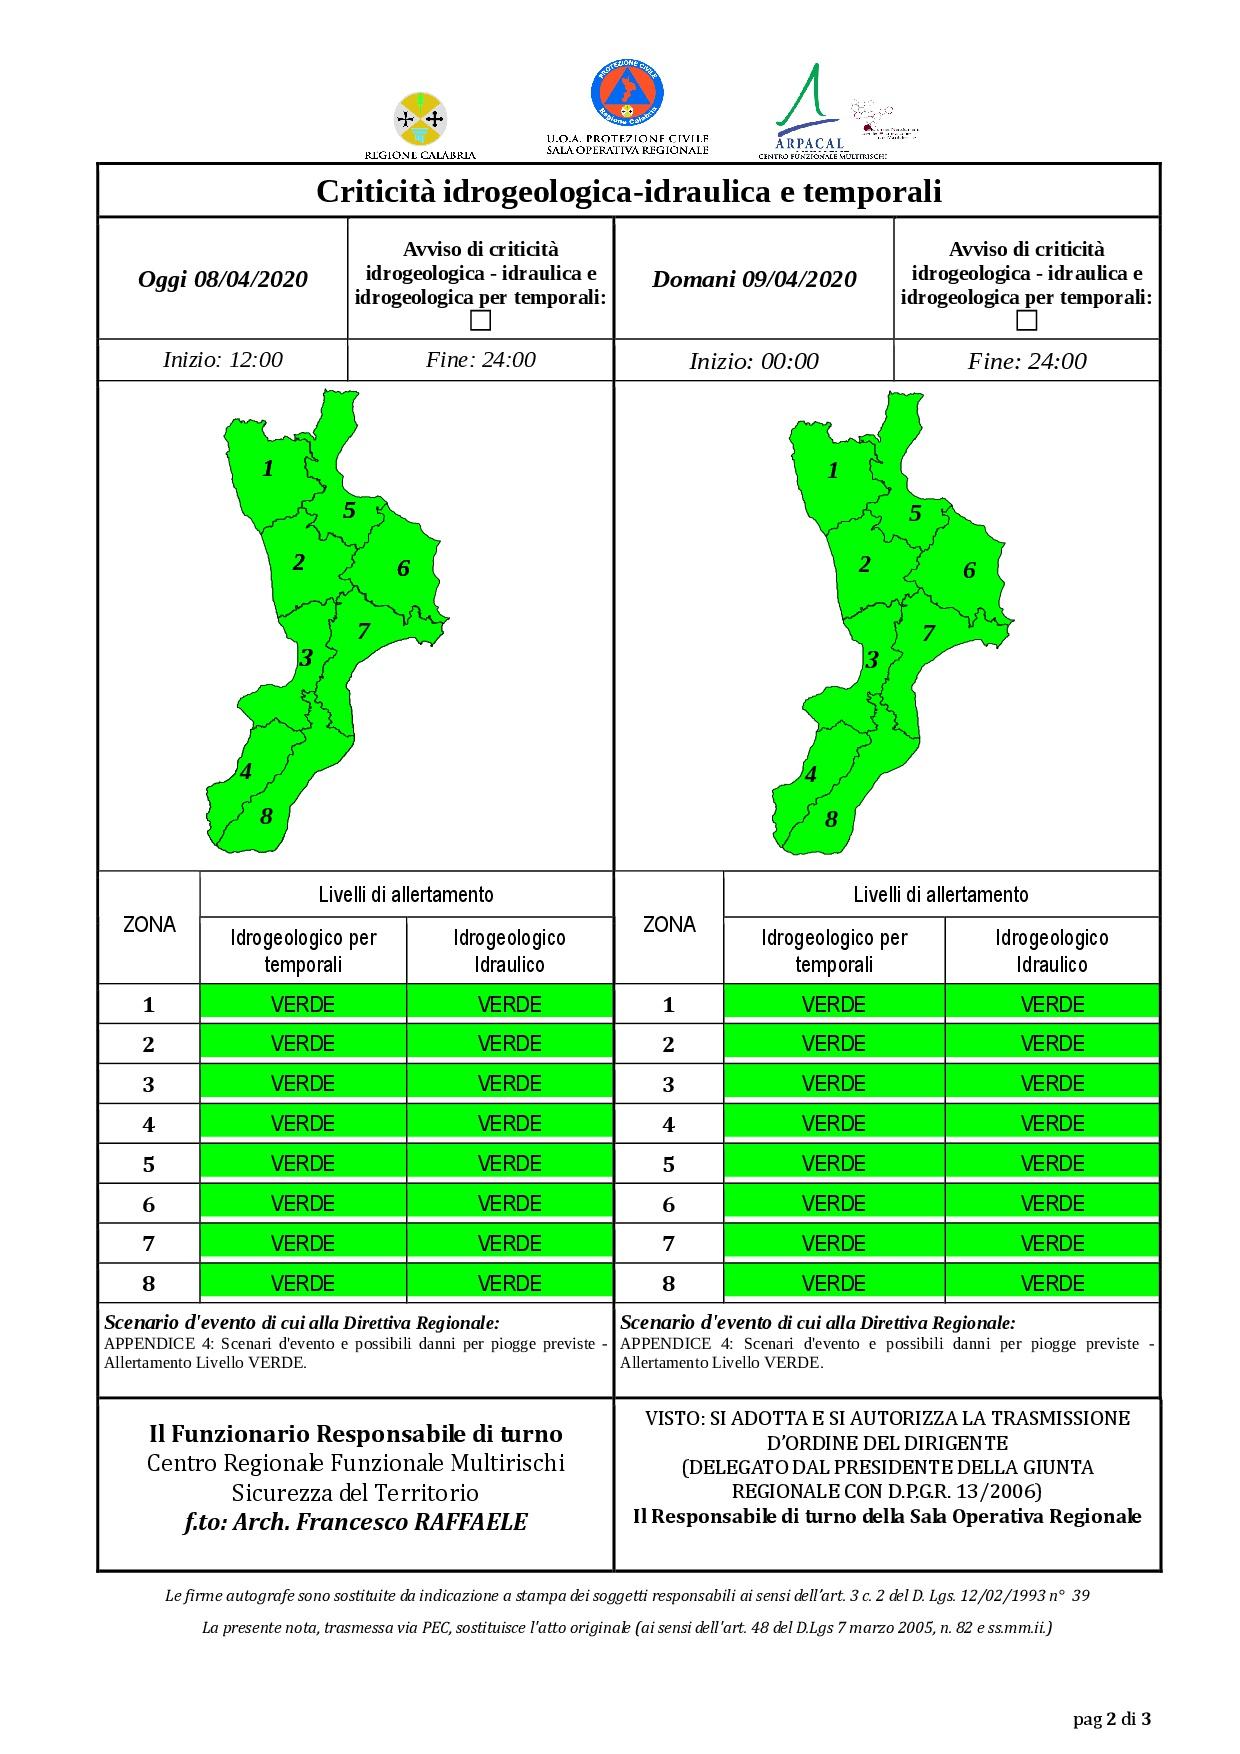 Criticità idrogeologica-idraulica e temporali in Calabria 08-04-2020